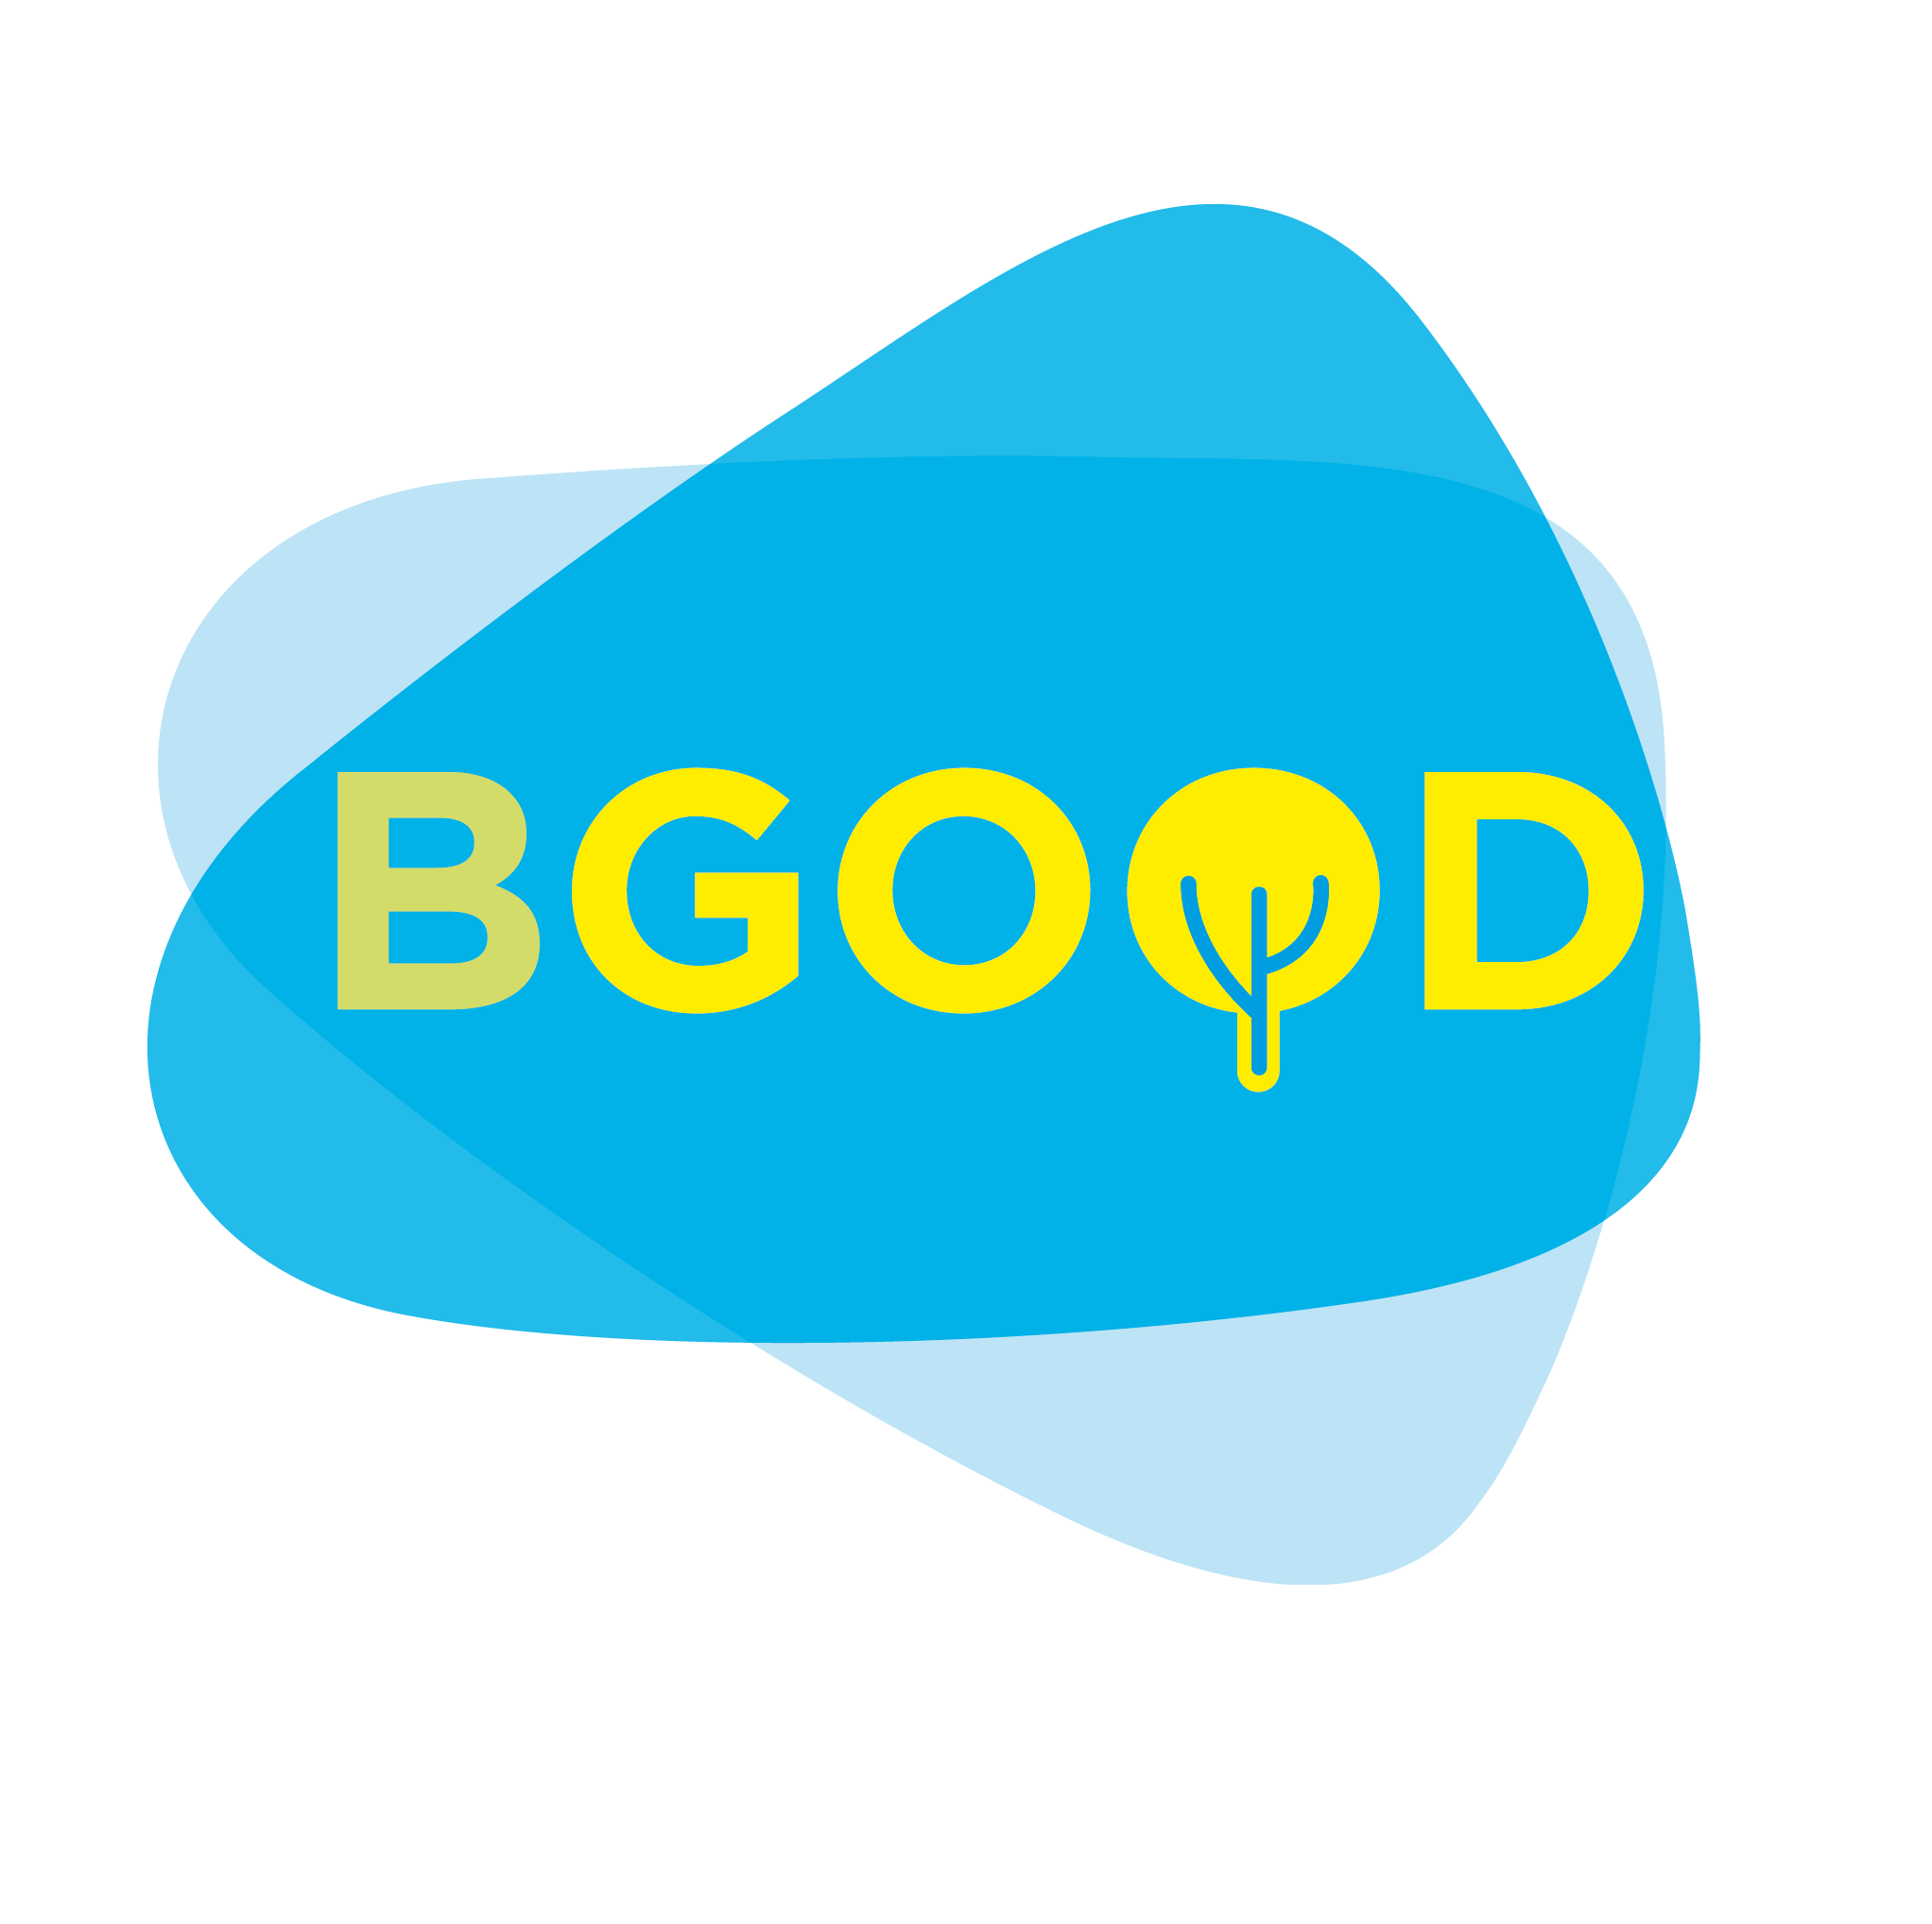 https://www.promotionmagazine.it/wp/wp-content/uploads/2016/08/BGOOD-4-COLORI-2.png